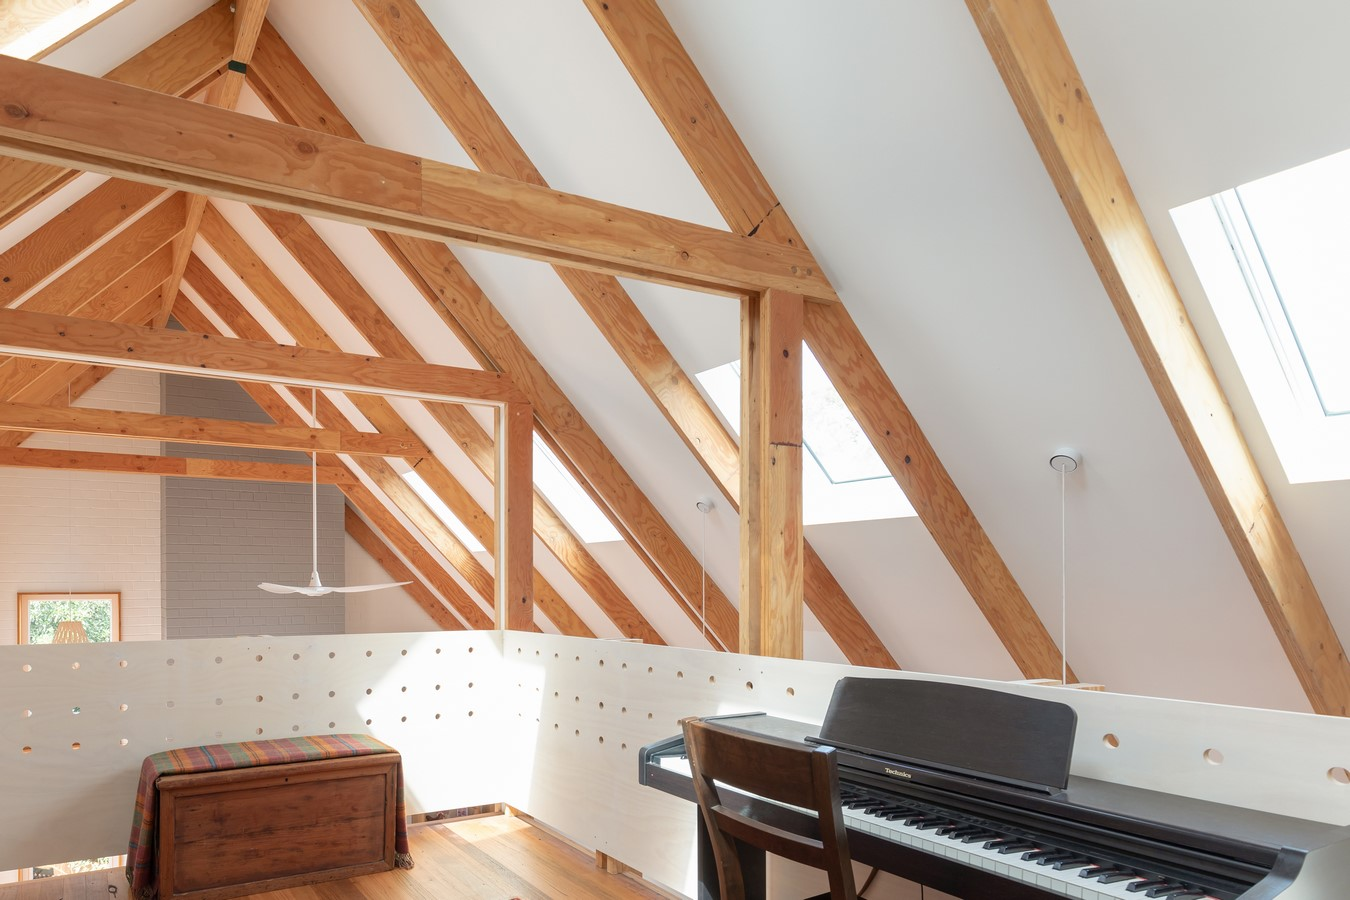 5088 Loft House by Rob Henry Architects: Sheet 2